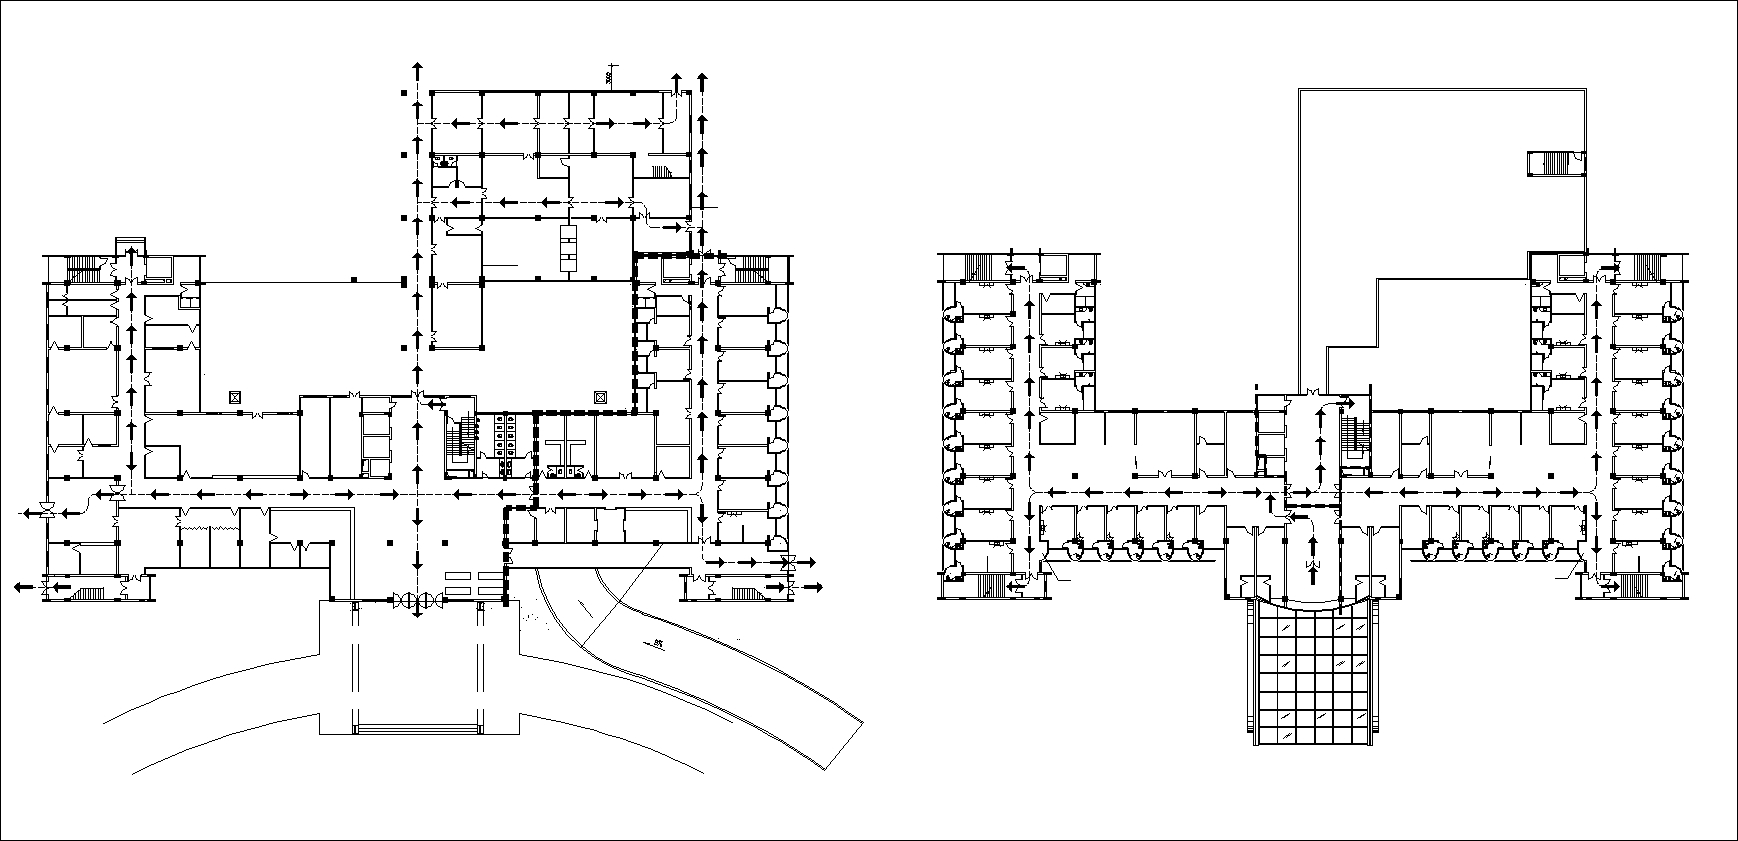 Hospital Design Drawings